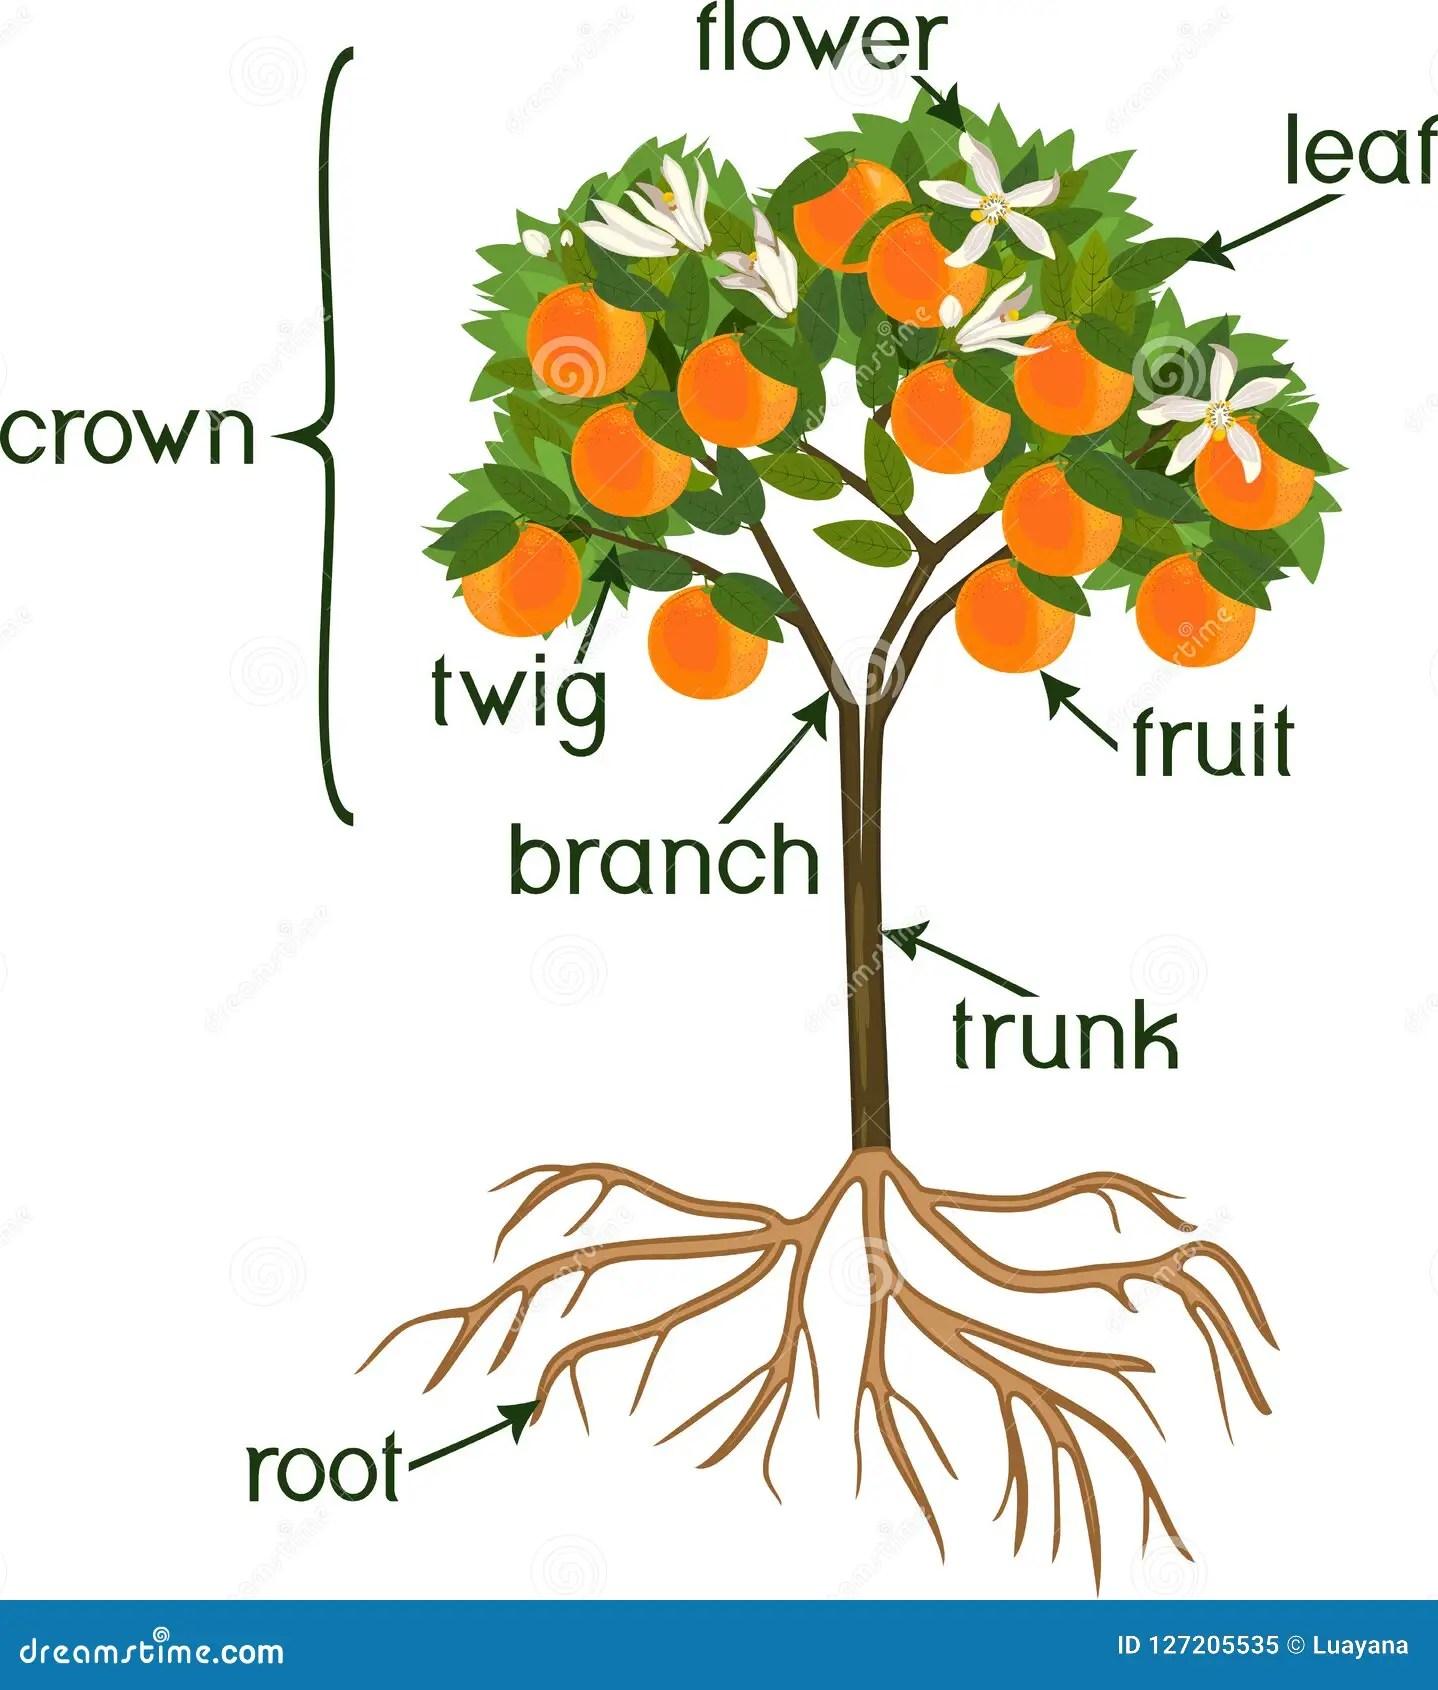 Parts Of Plant Morphology Of Orange Tree With Fruits